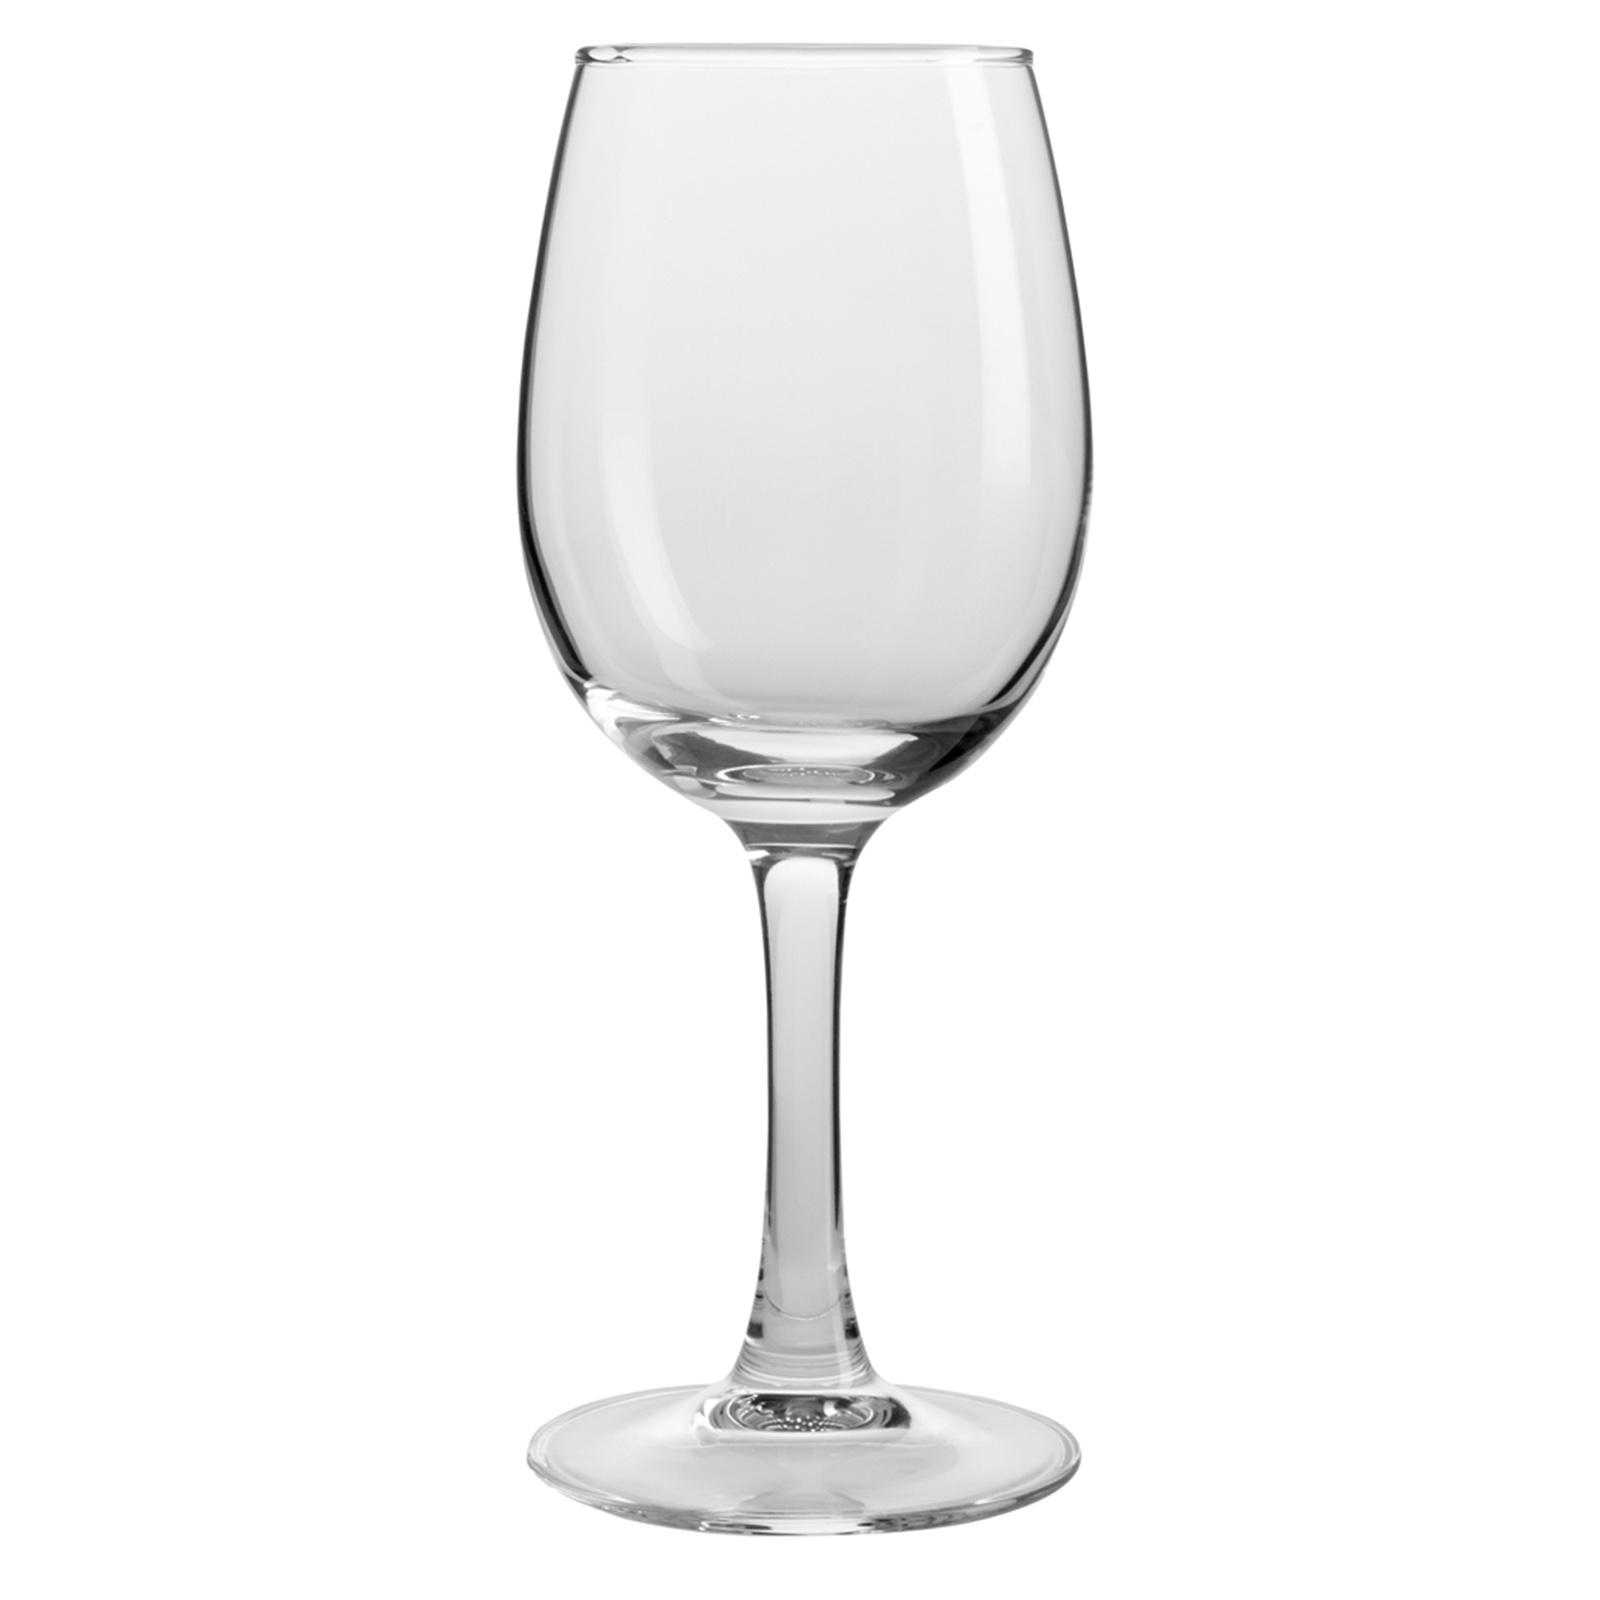 Cardinal P0775 glass, wine